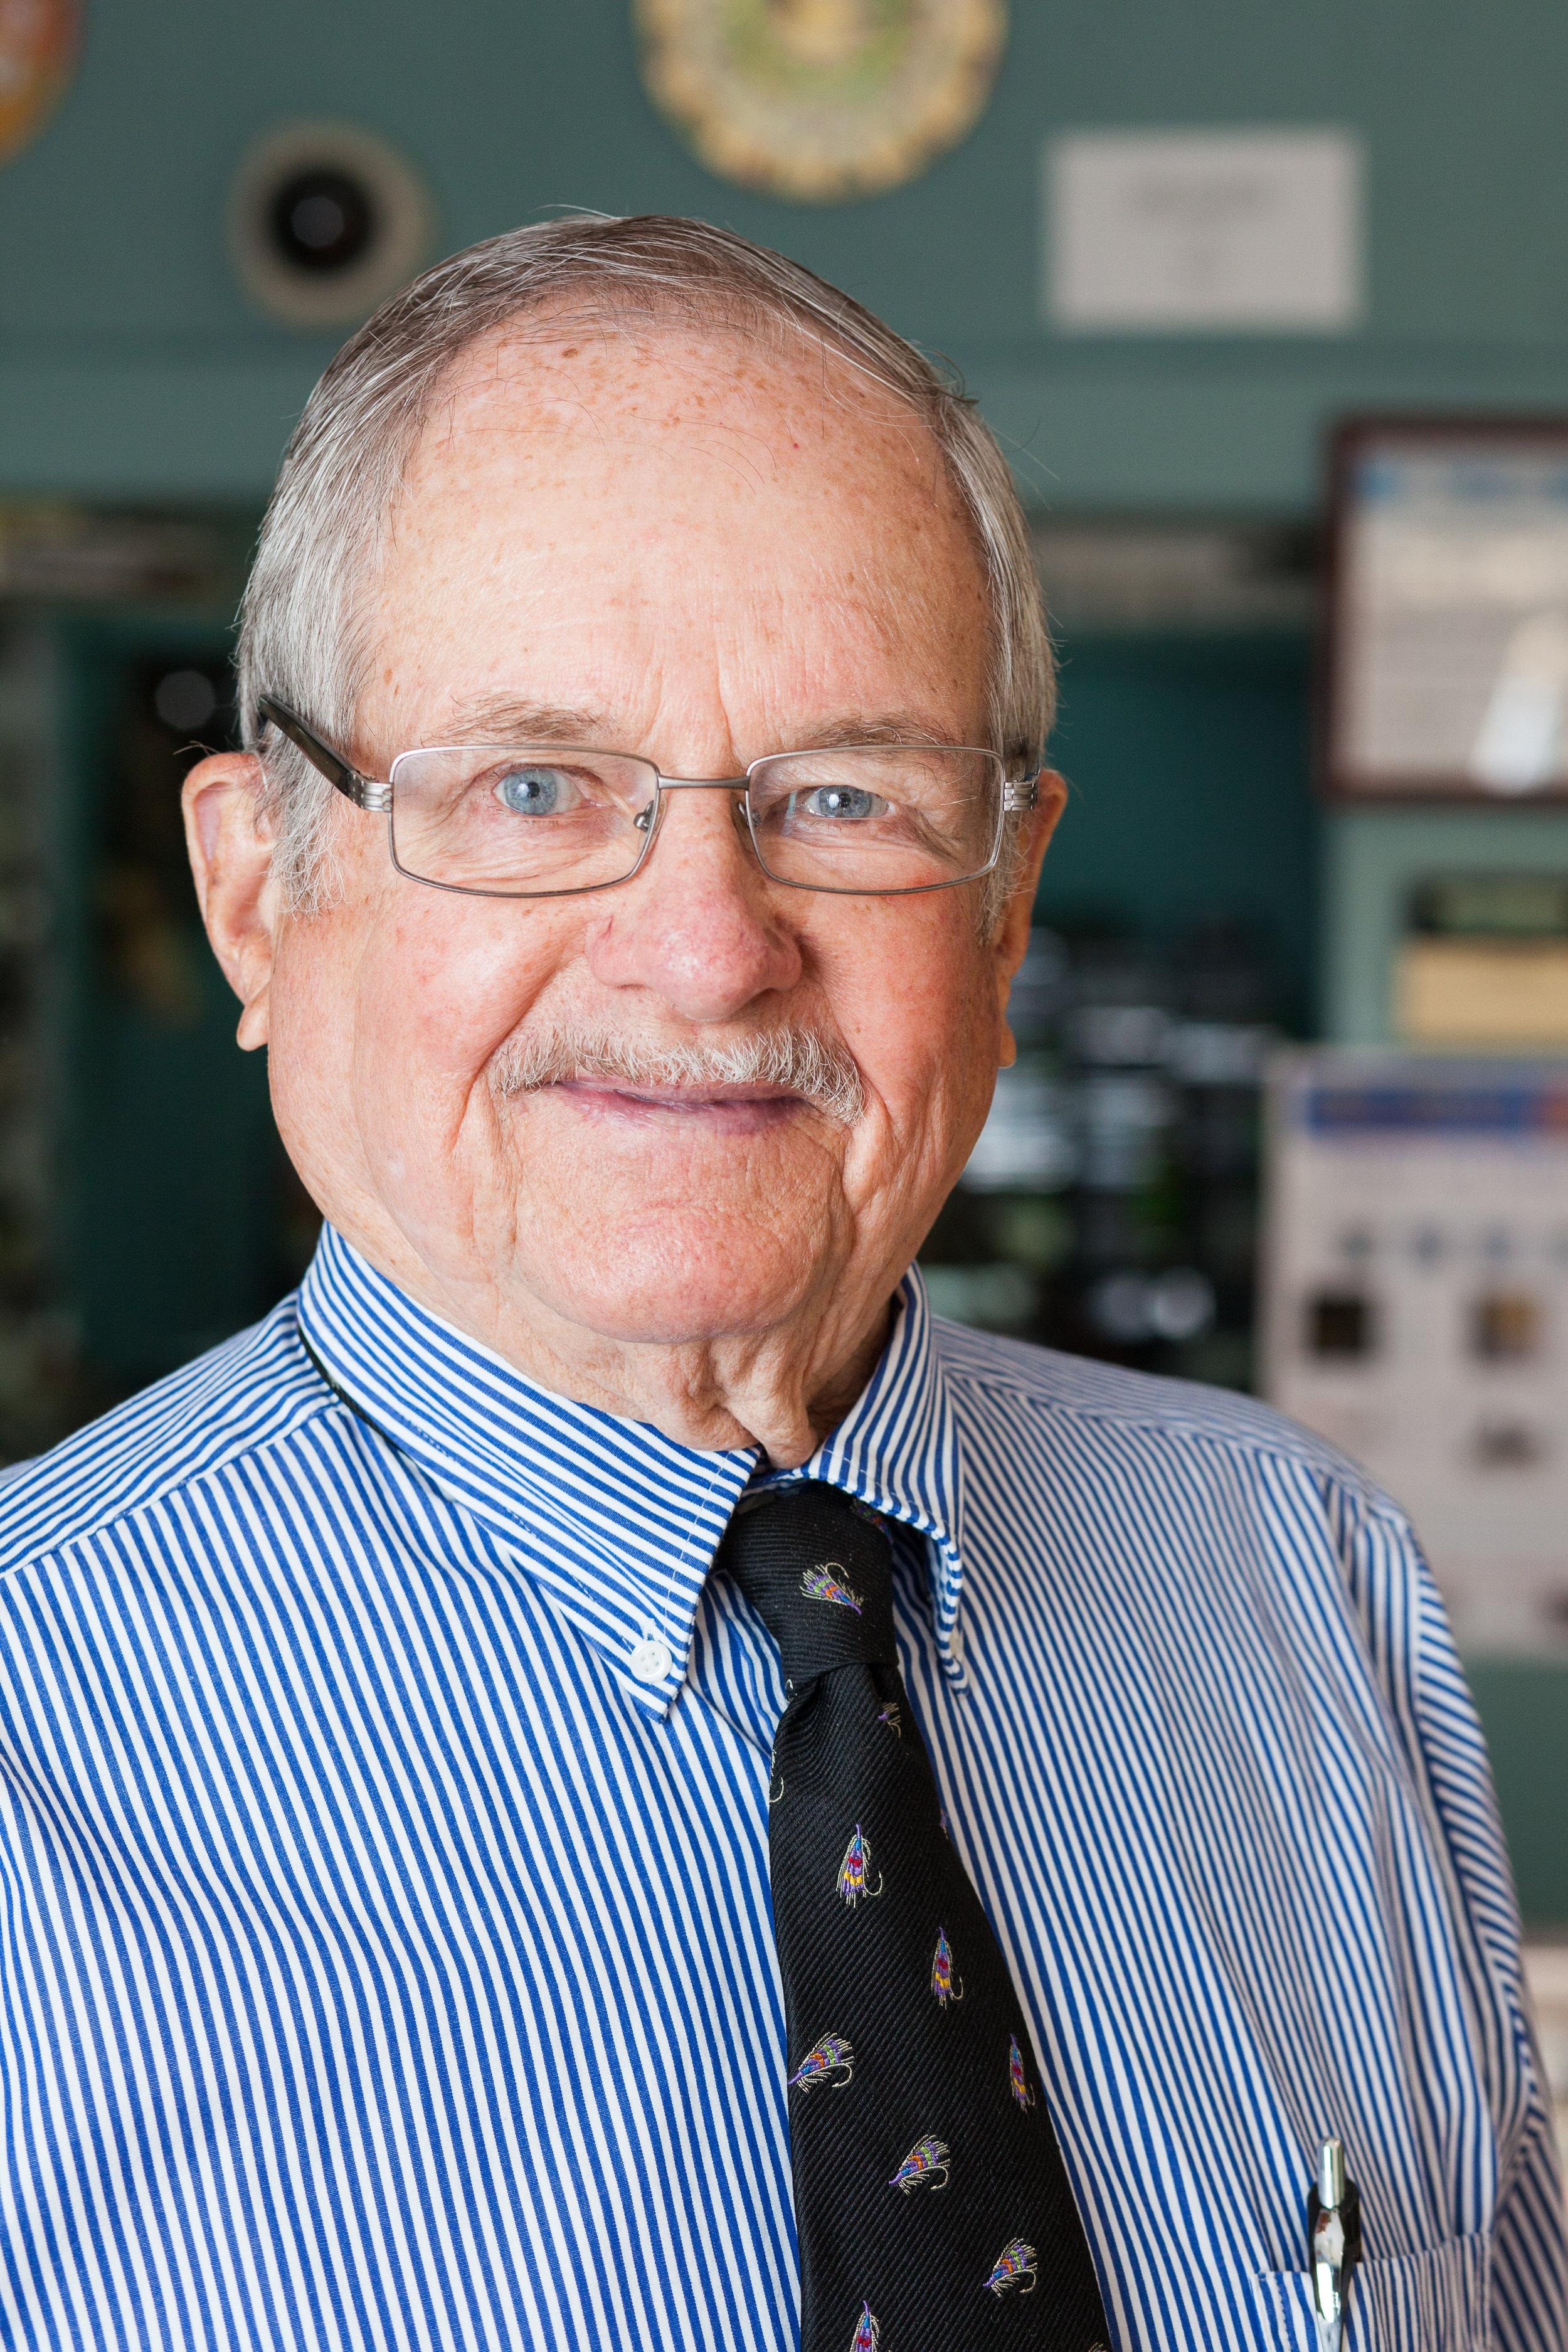 Max Reiss, 2nd Generation Jeweler